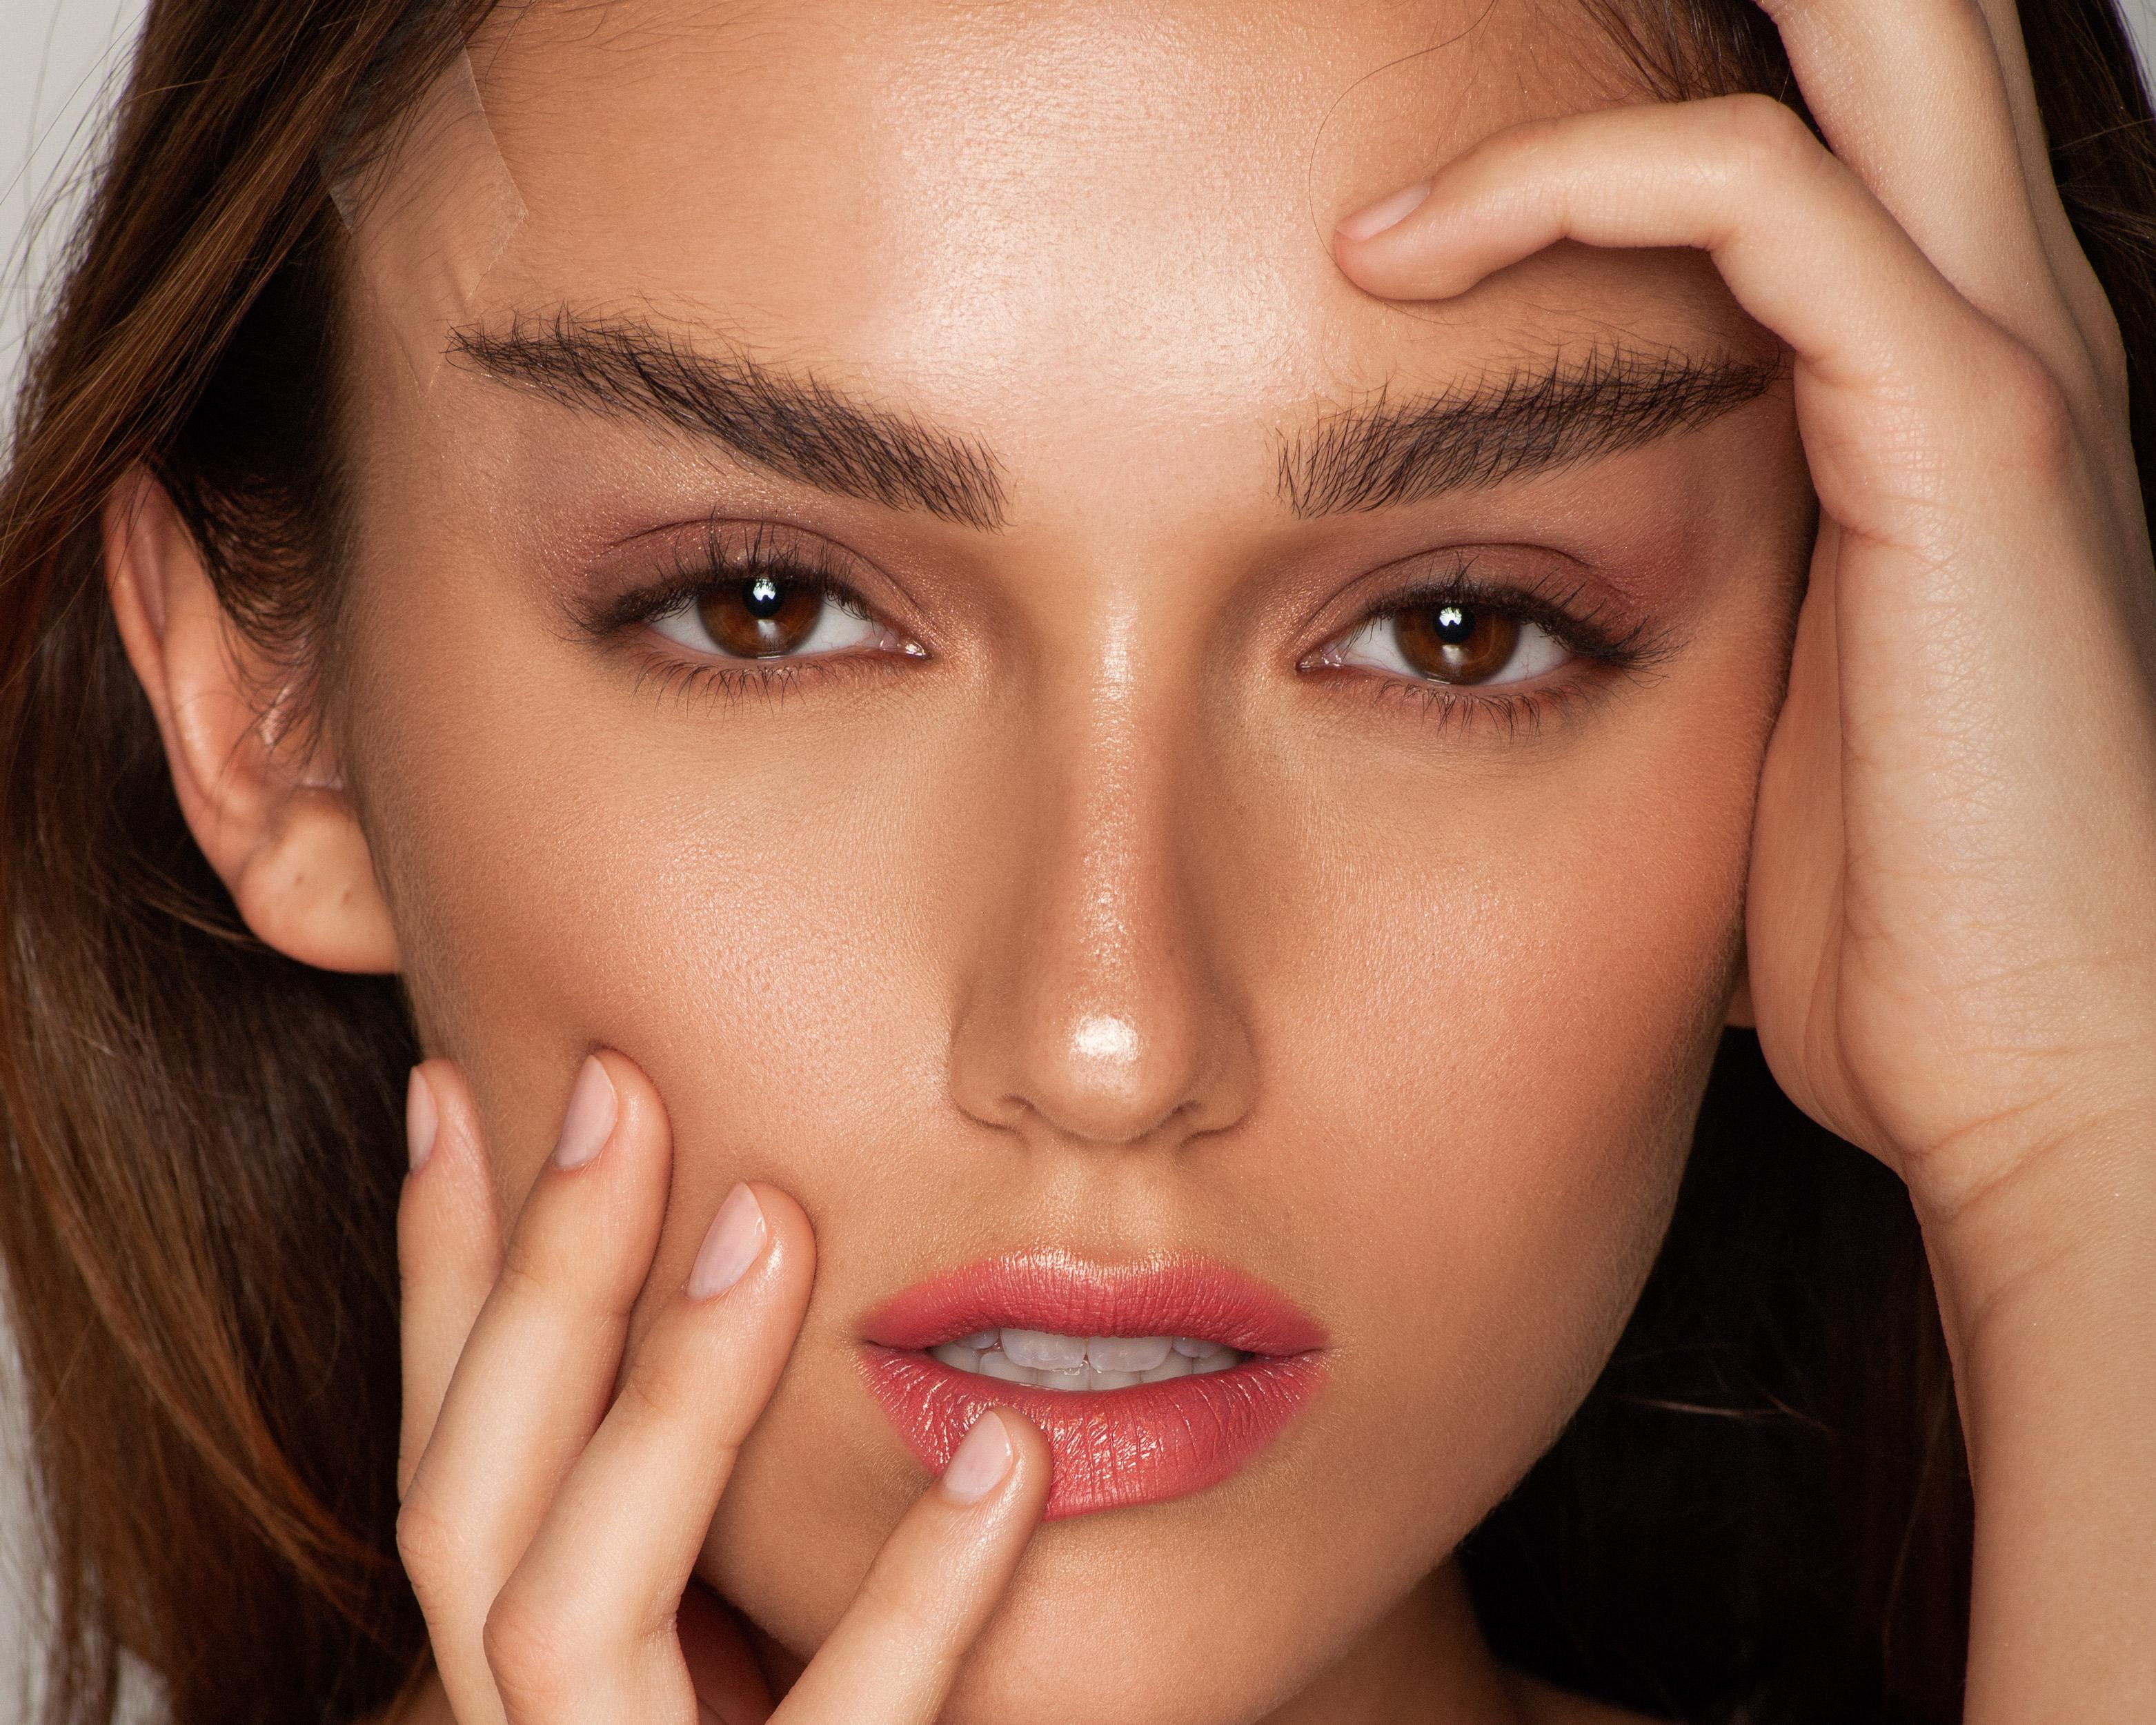 beauty, beauté, specs, models, model, montreal, canada, fashion, photographer, Mégane Brunette, Nelly, Judy inc,